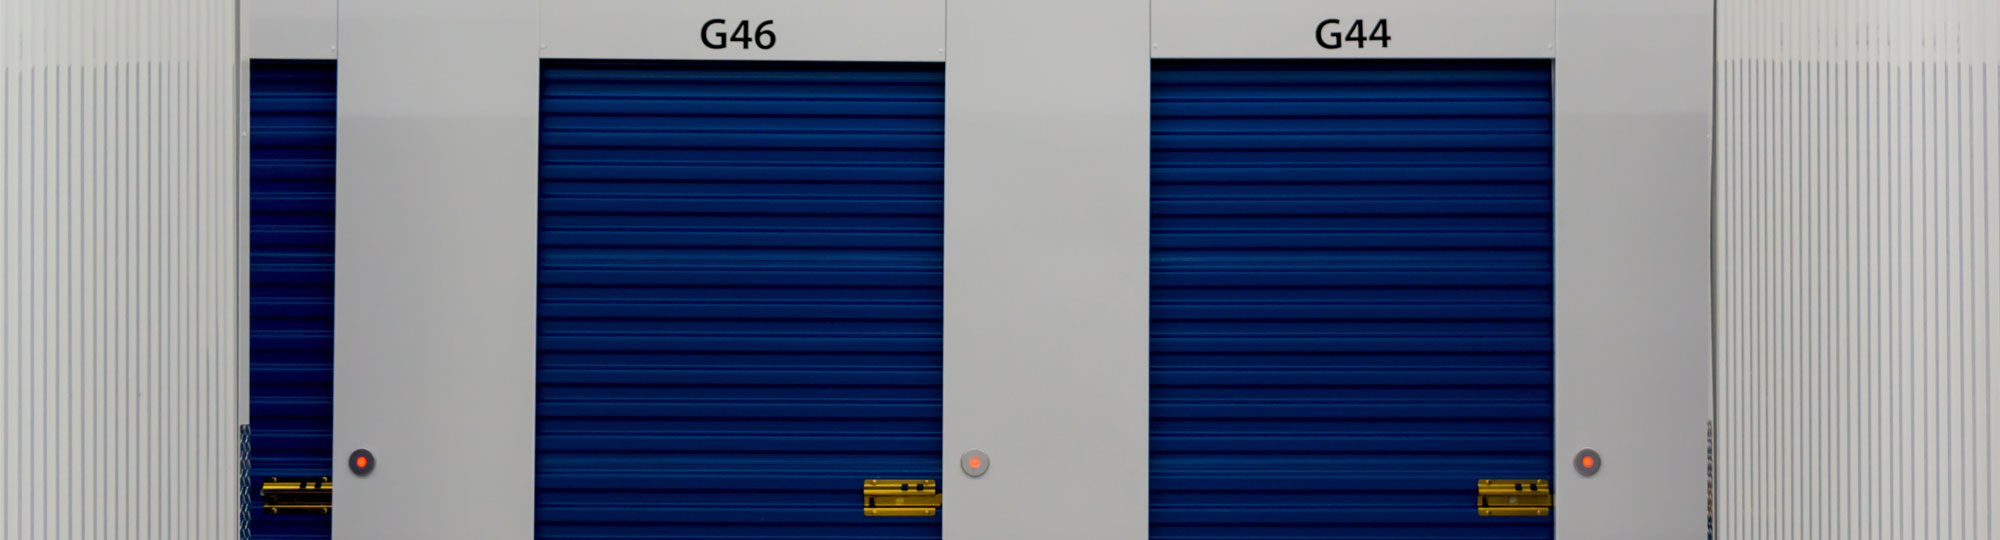 hallway_swing_doors_bg